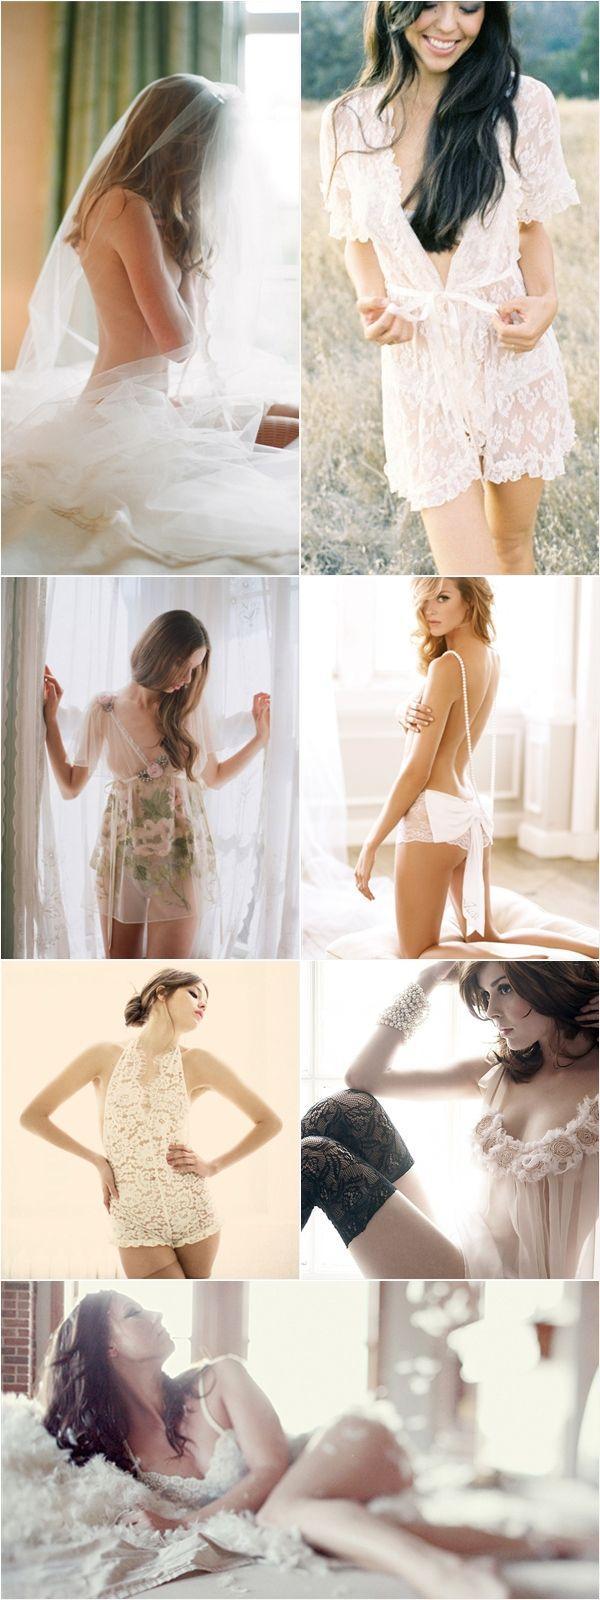 bedroom photography ideas. 25 Artistic Boudoir Ideas 24 Best Photography Images On Pinterest